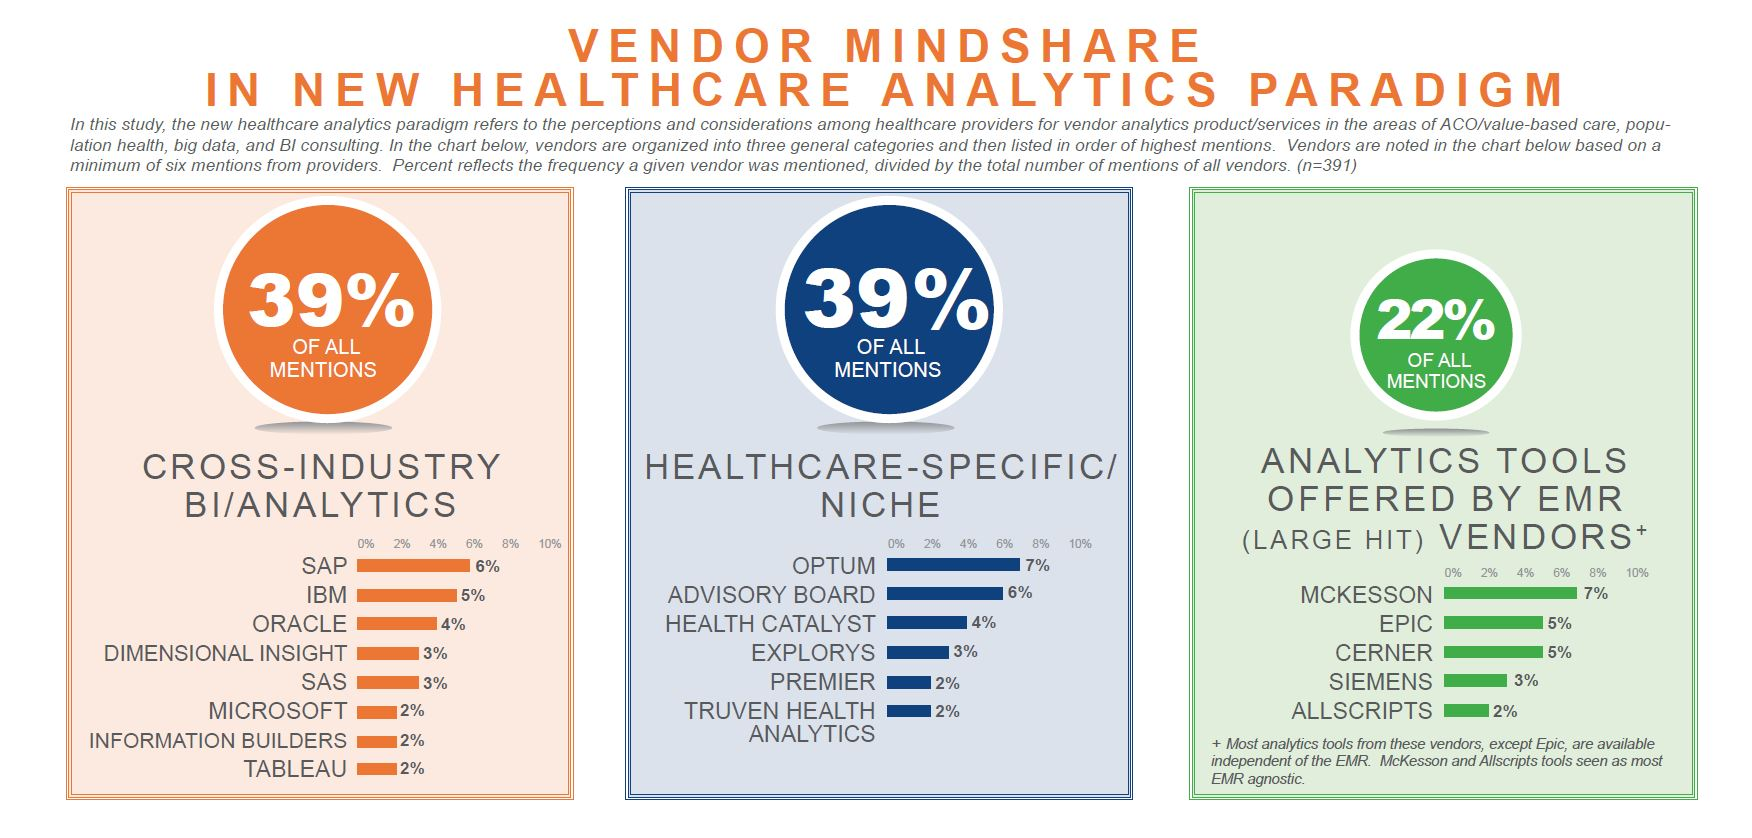 vendor mindshare in new healthcare analytics paradigm